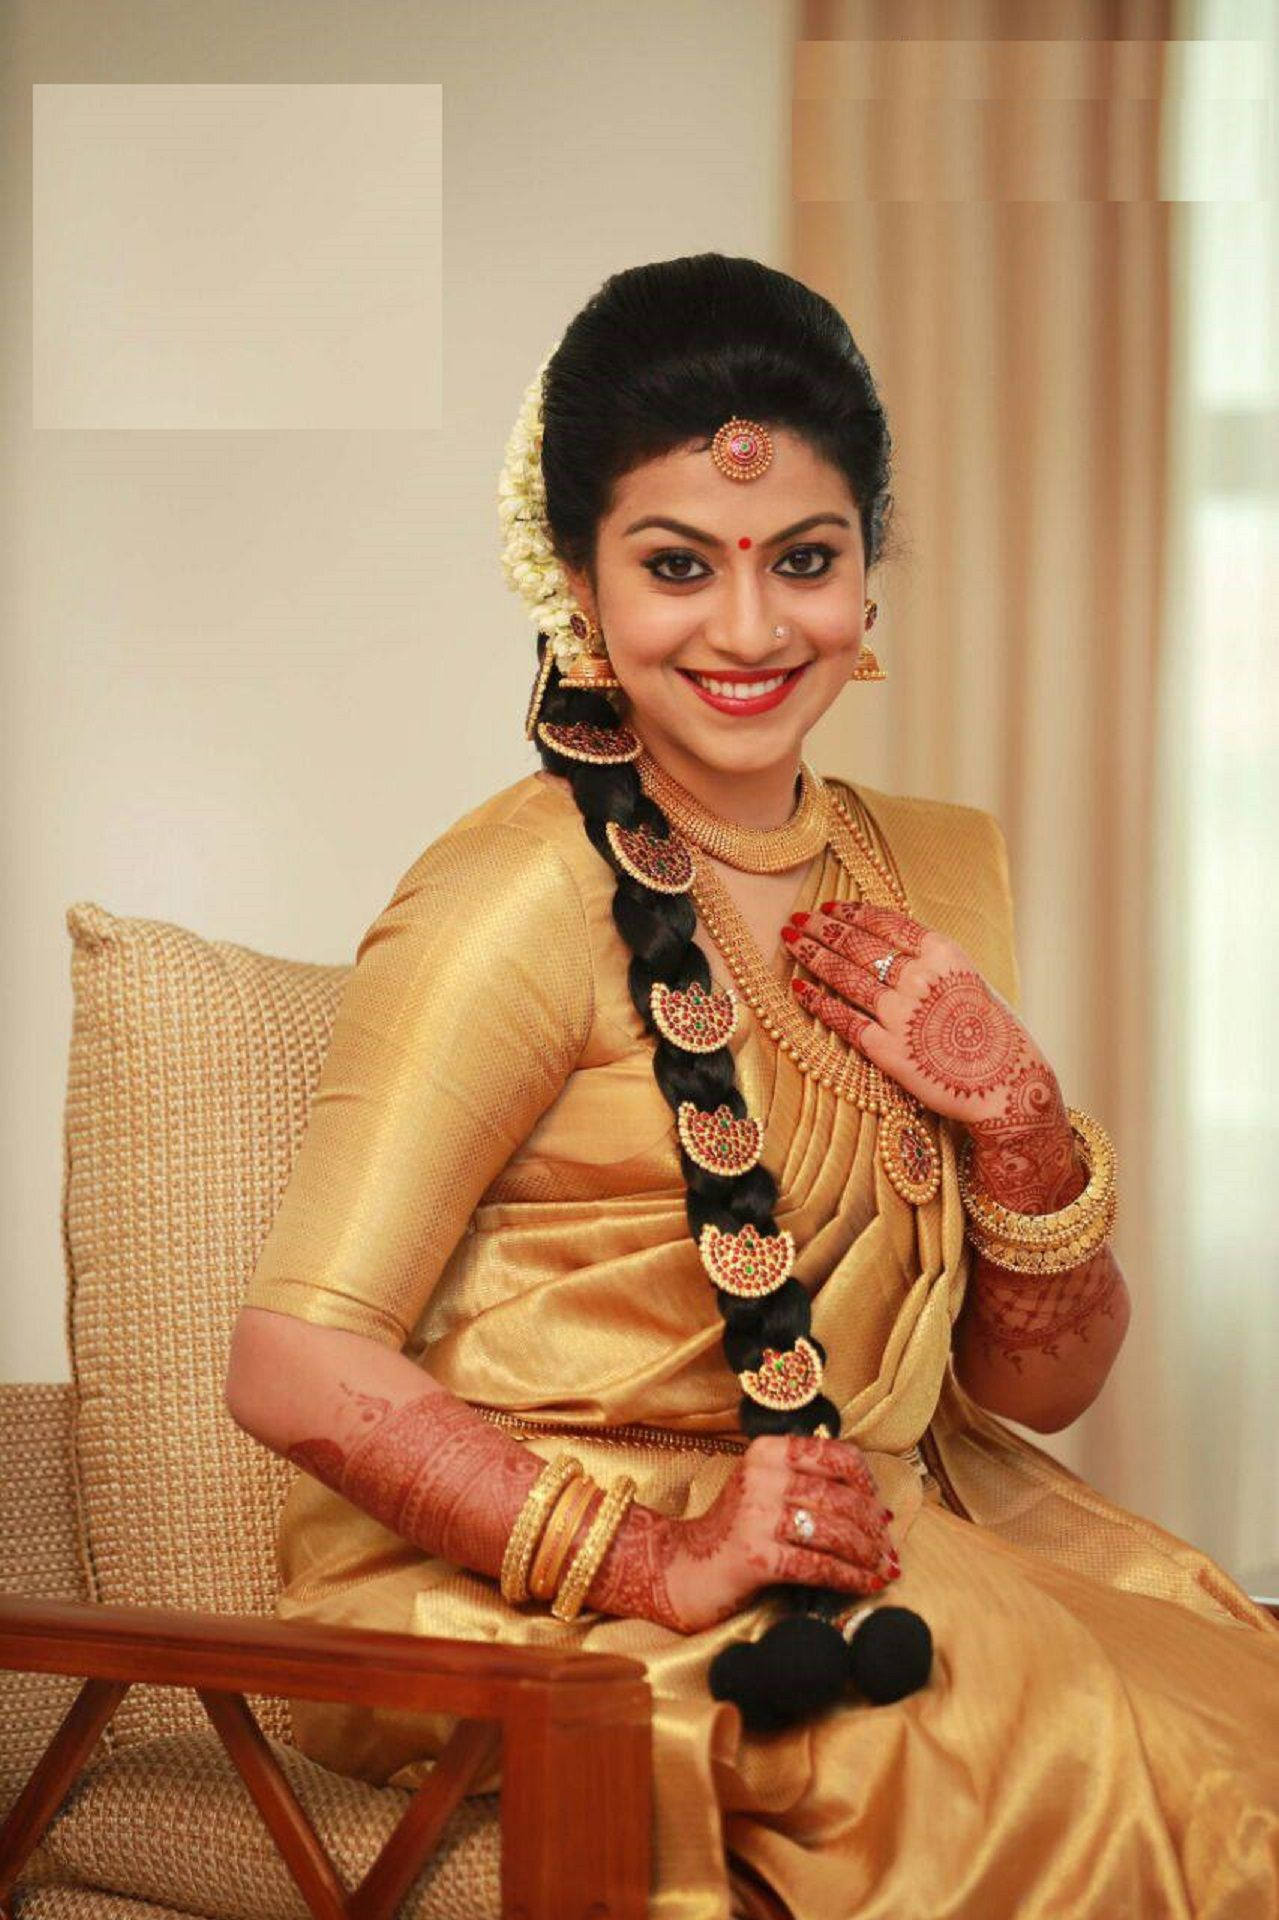 Pin By Priya Nair On Wedding Trend In 2019 Malayali Bride